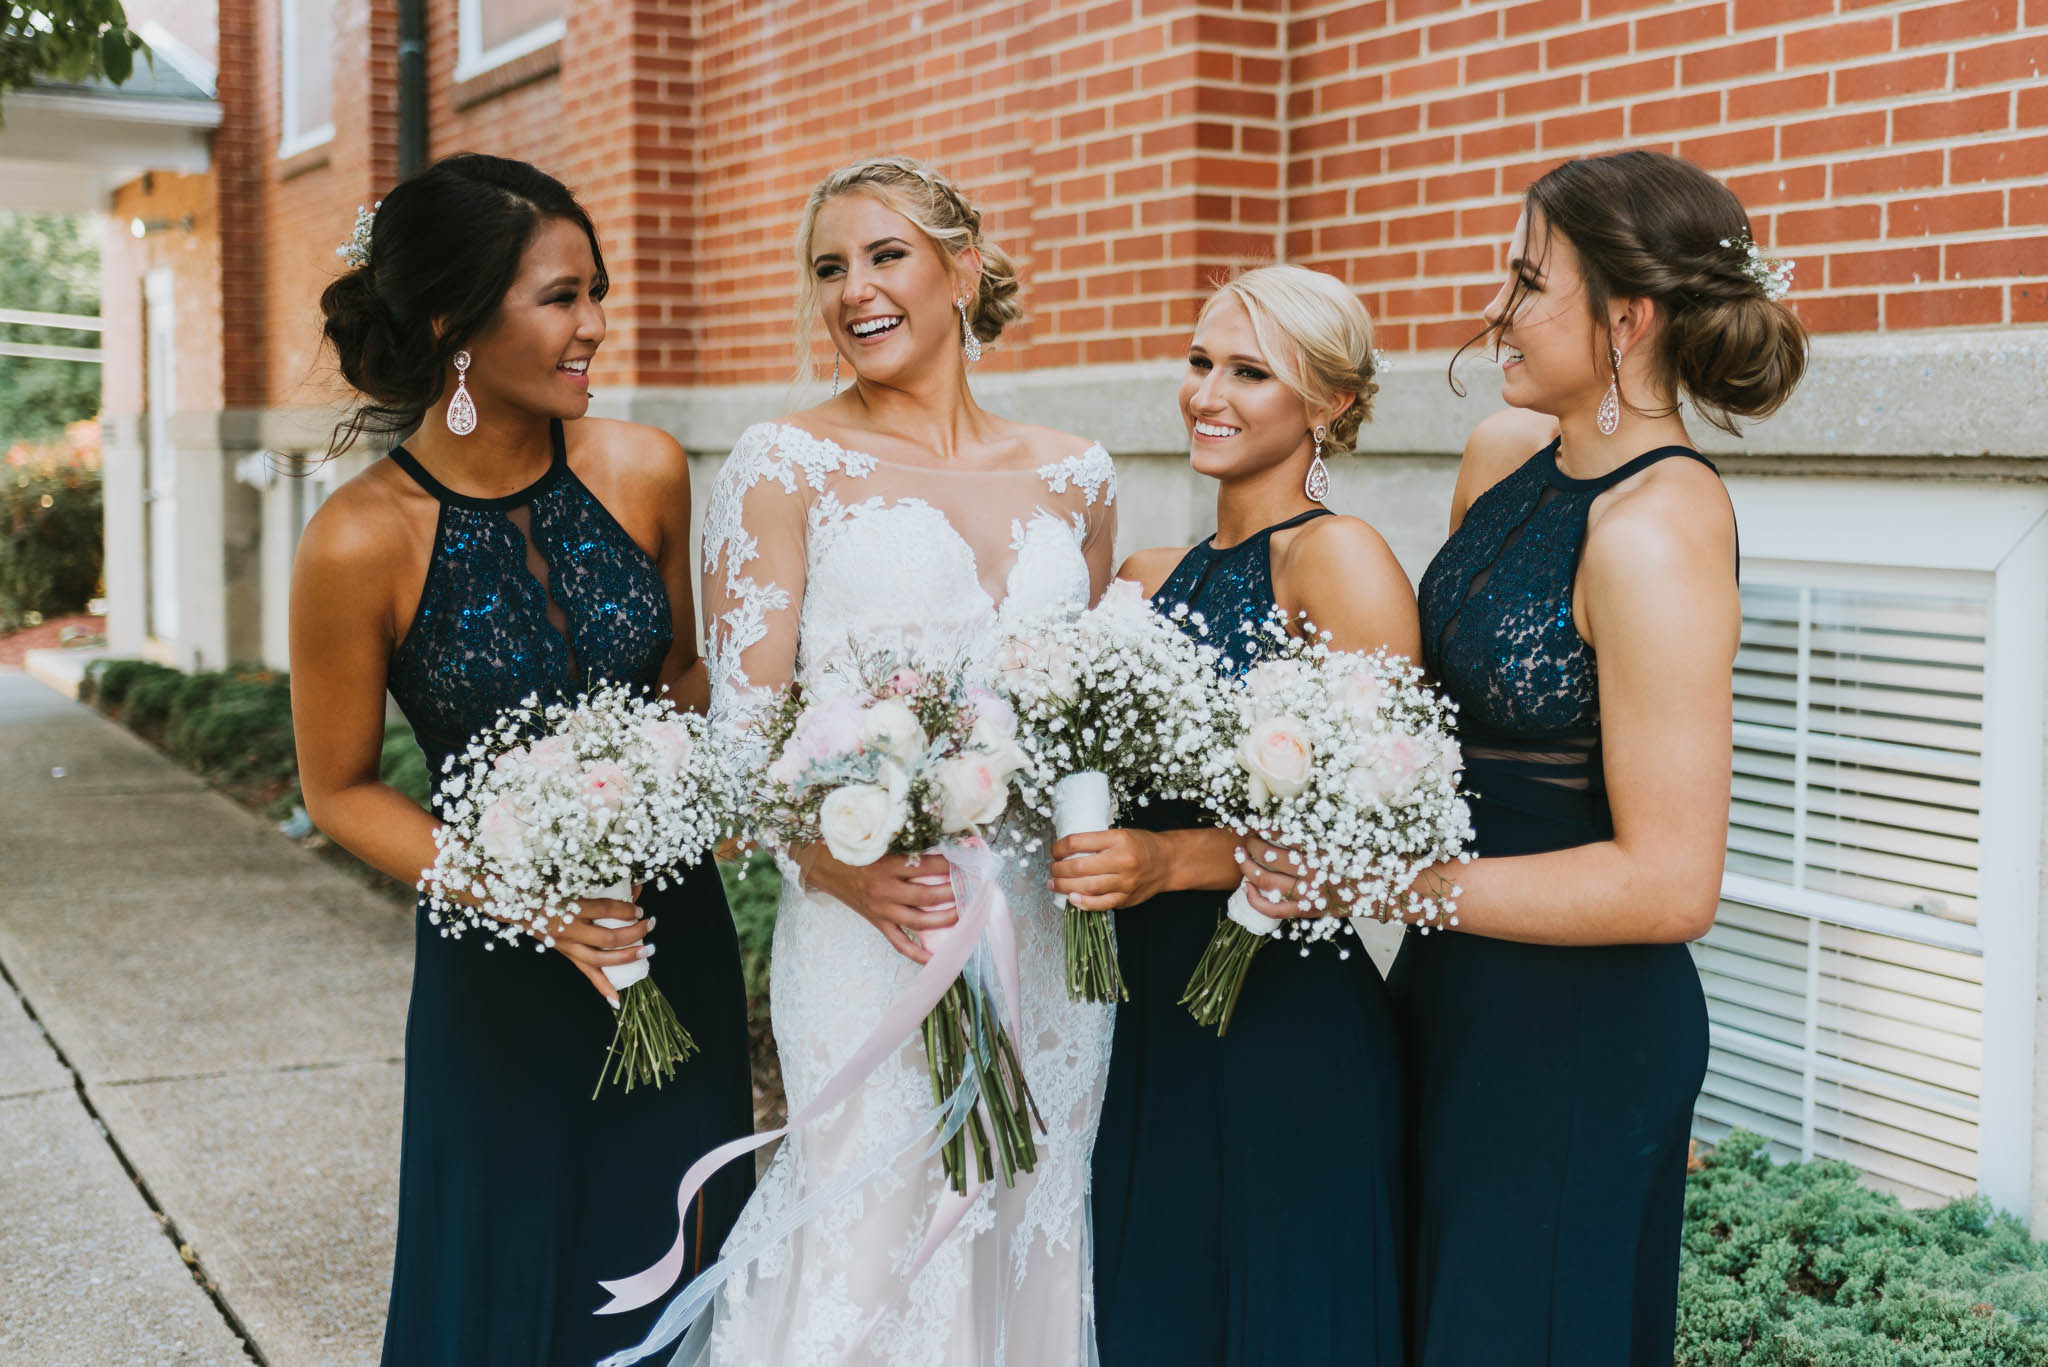 The Social Event Facility Wedding, Kingsport, TN, Northeast TN Wedding Photography, East Tennessee Wedding Photography, Knoxville, TN Wedding Photography